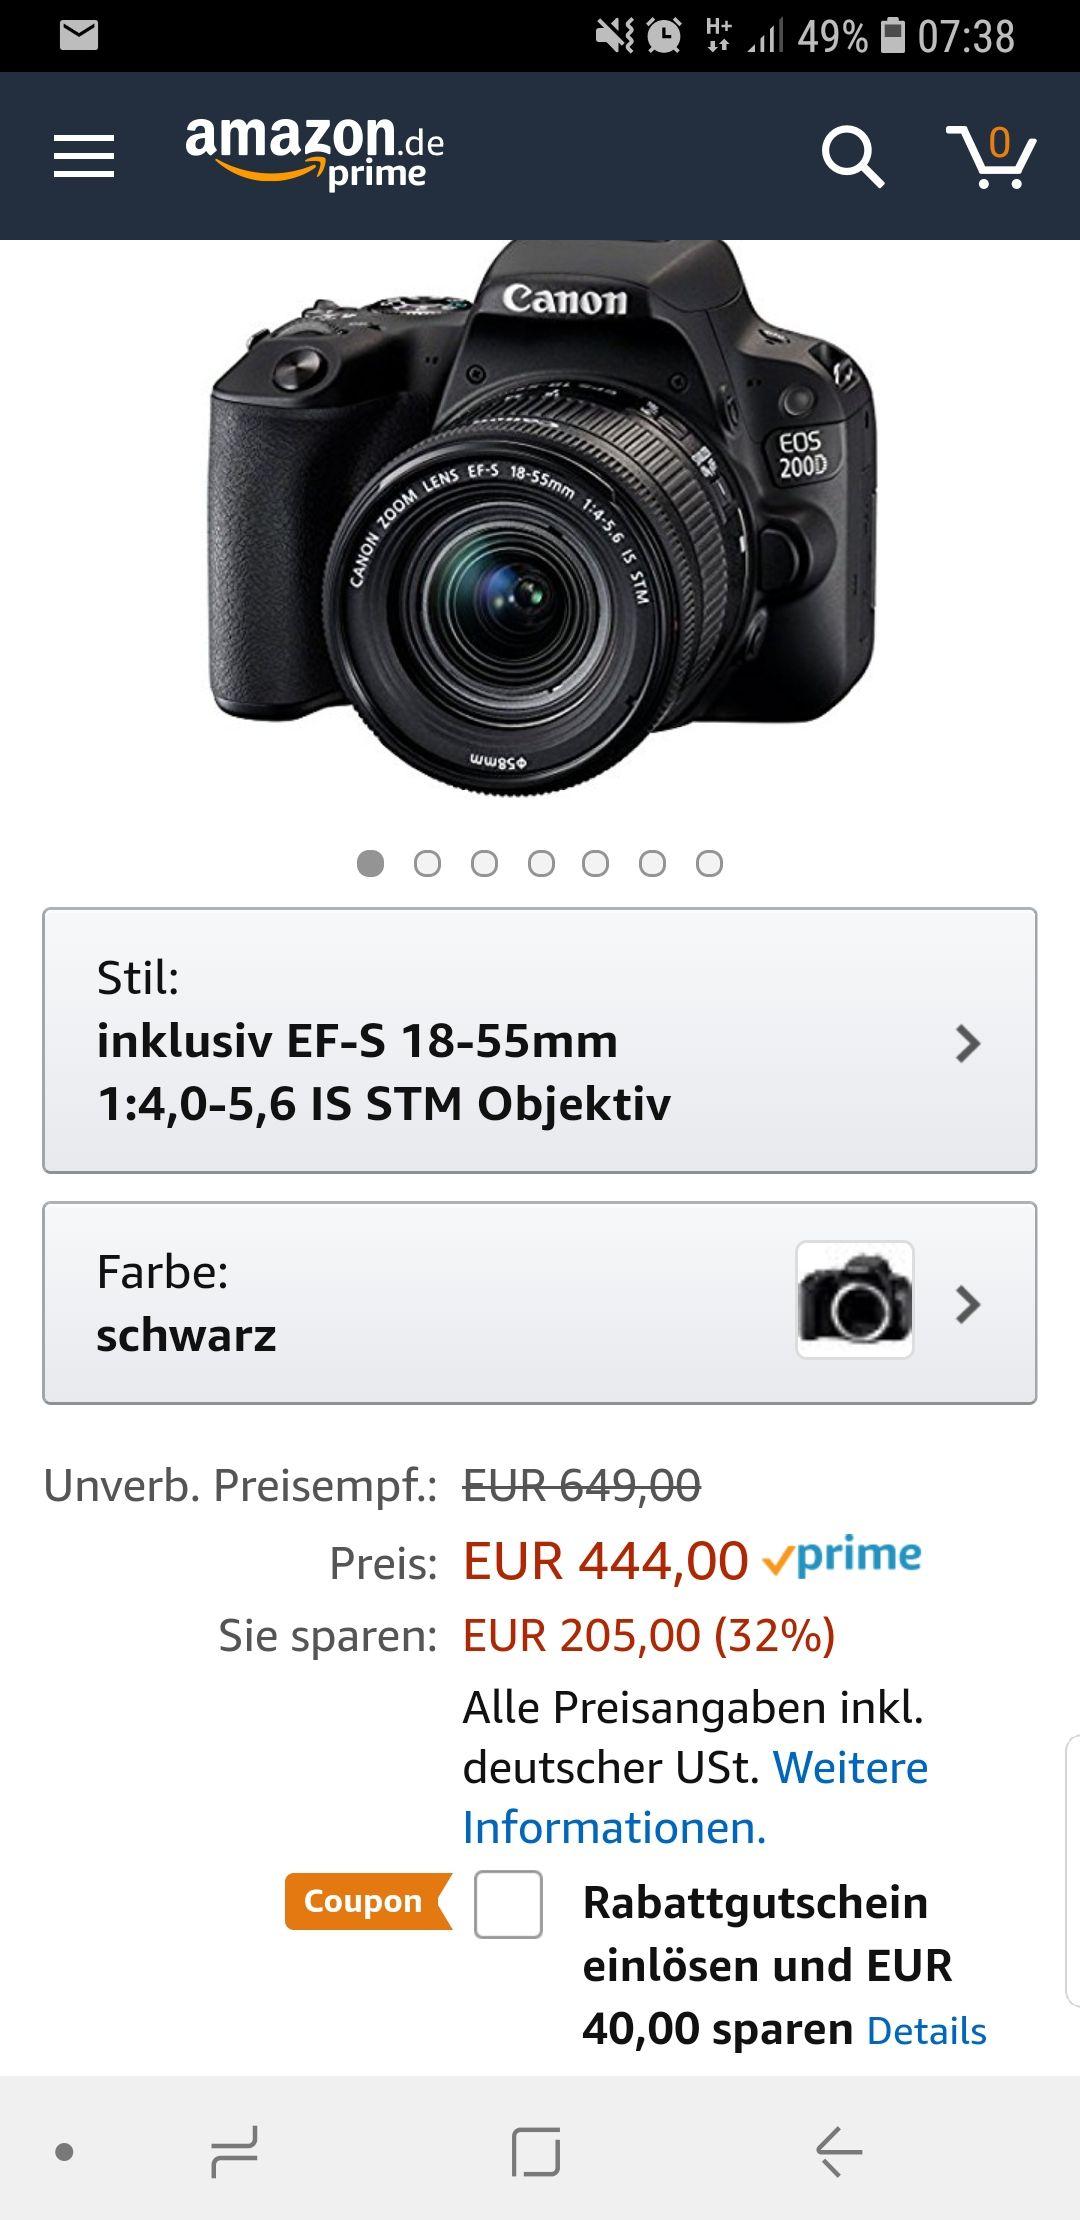 Canon EOS 200d KiT mit Objektiv